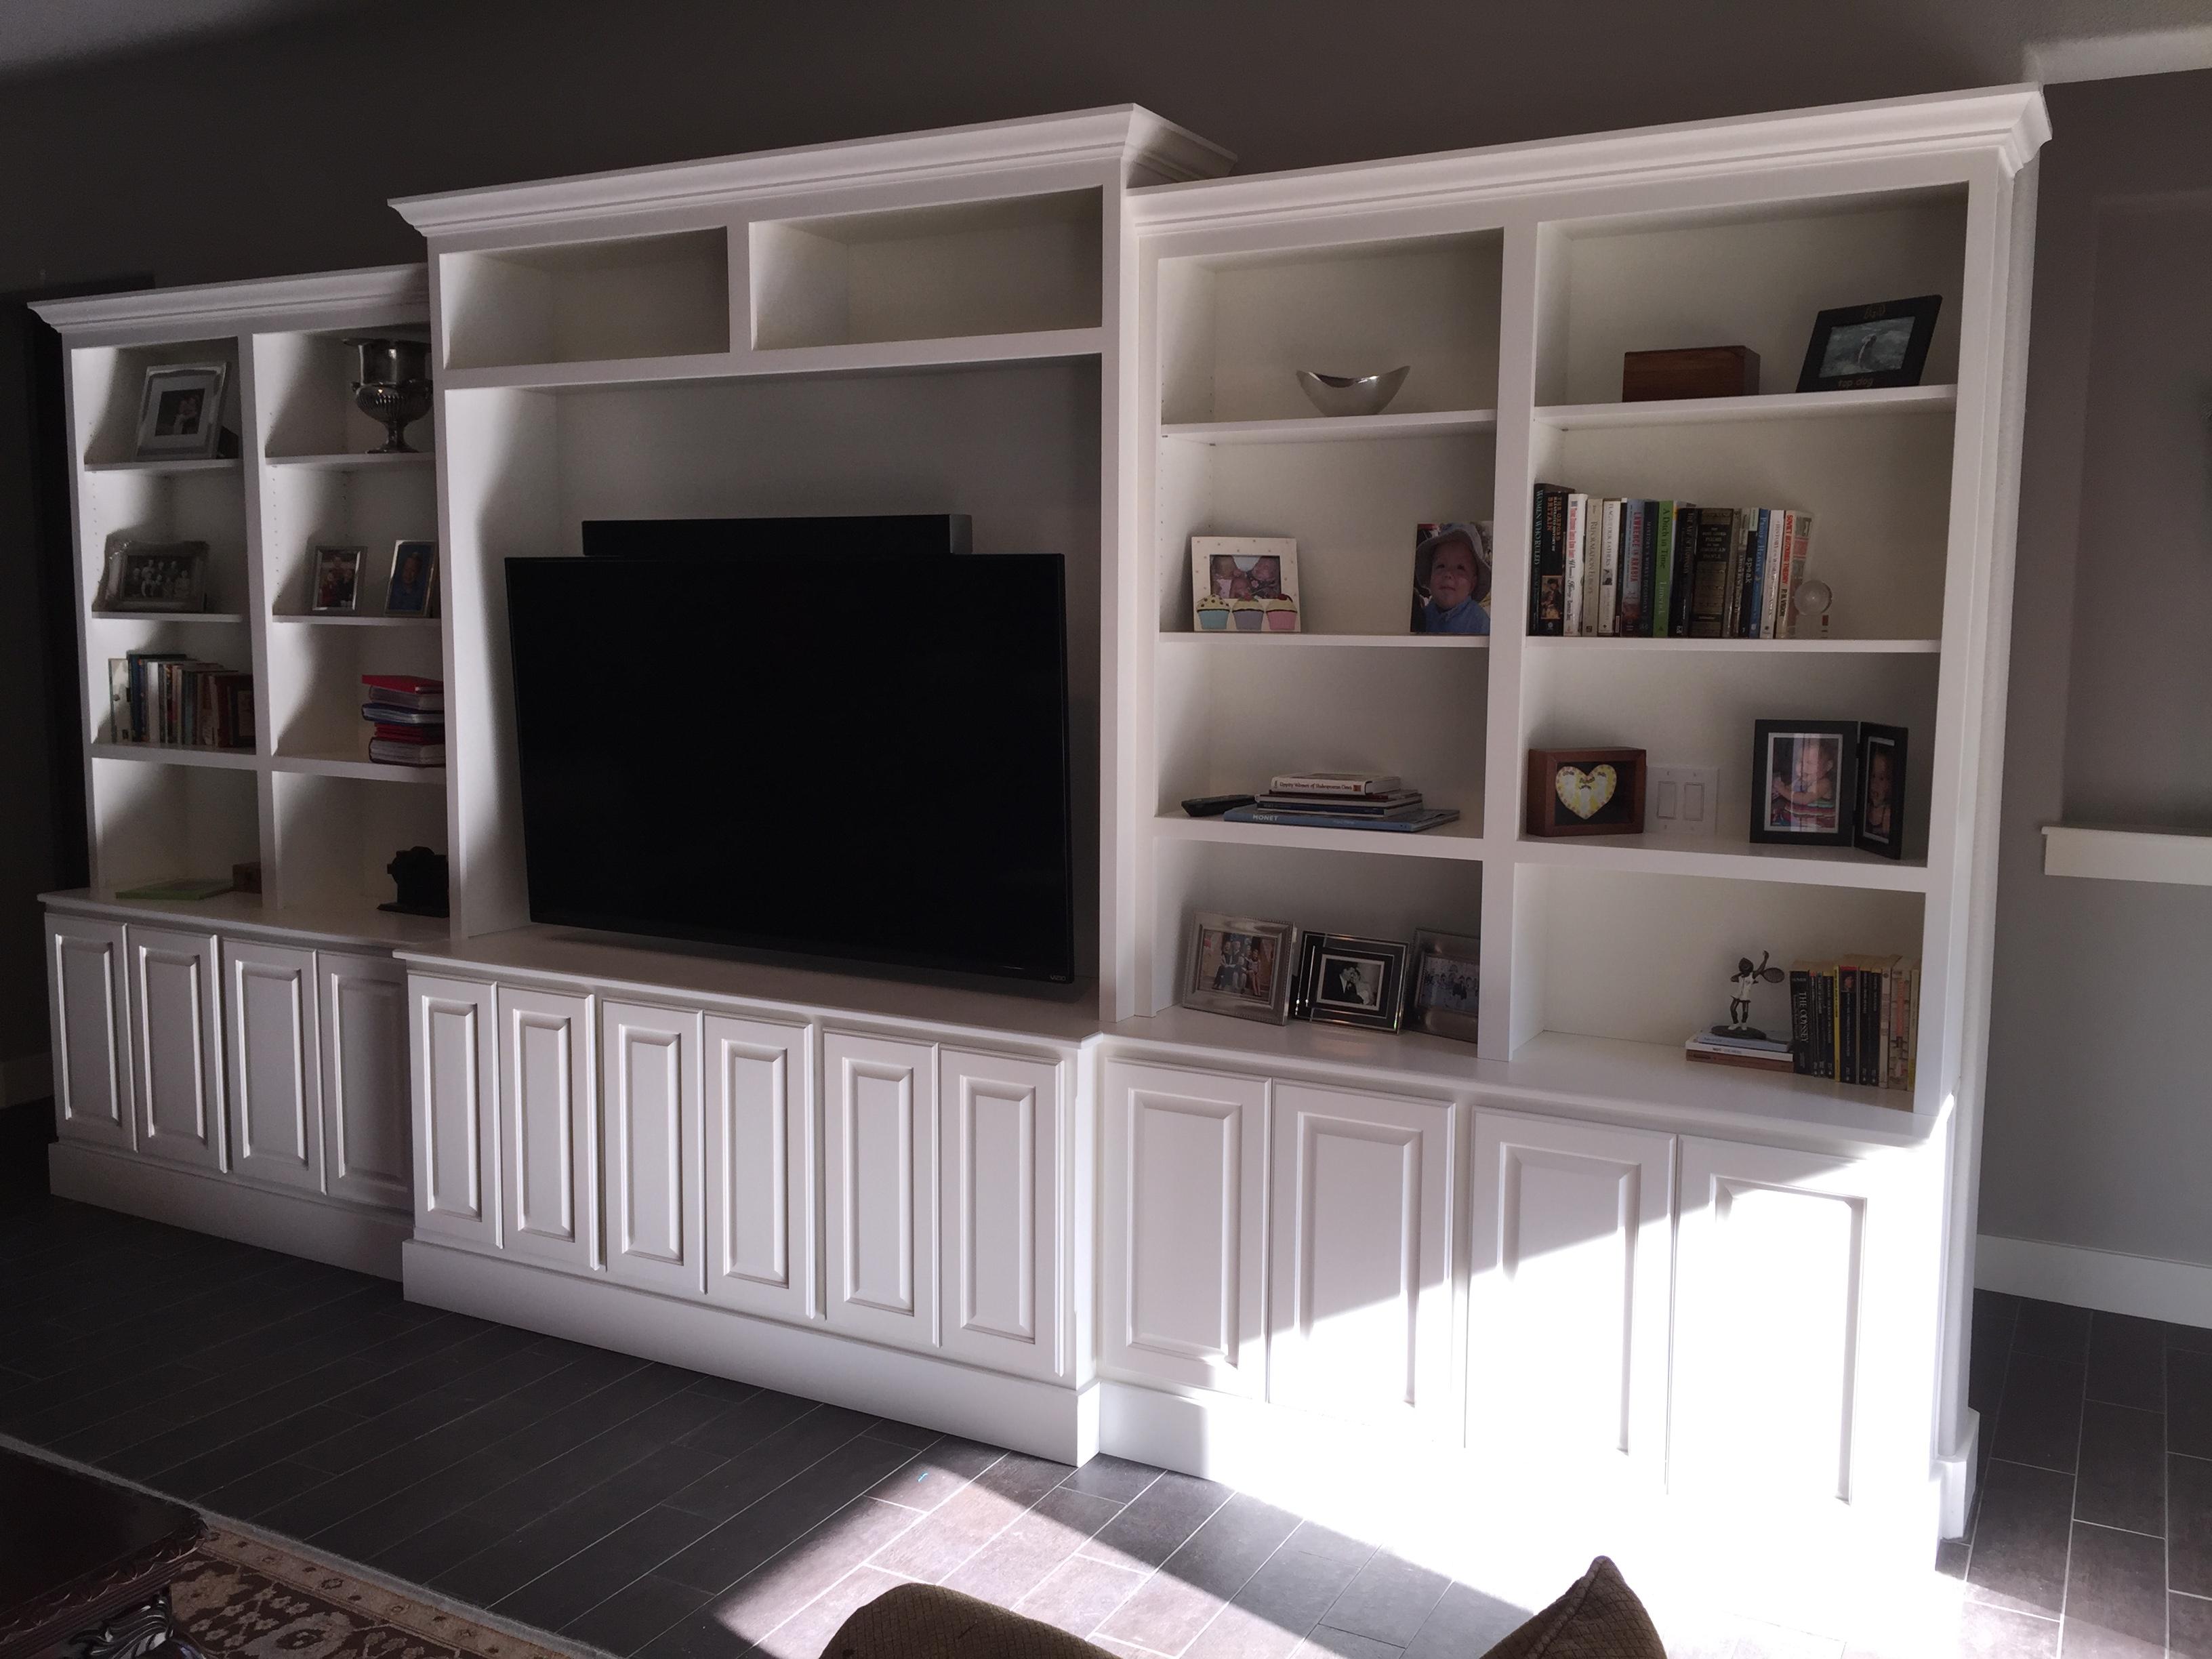 Jaimes custom cabinets white entertainment center built in for Built in entertainment center using kitchen cabinets